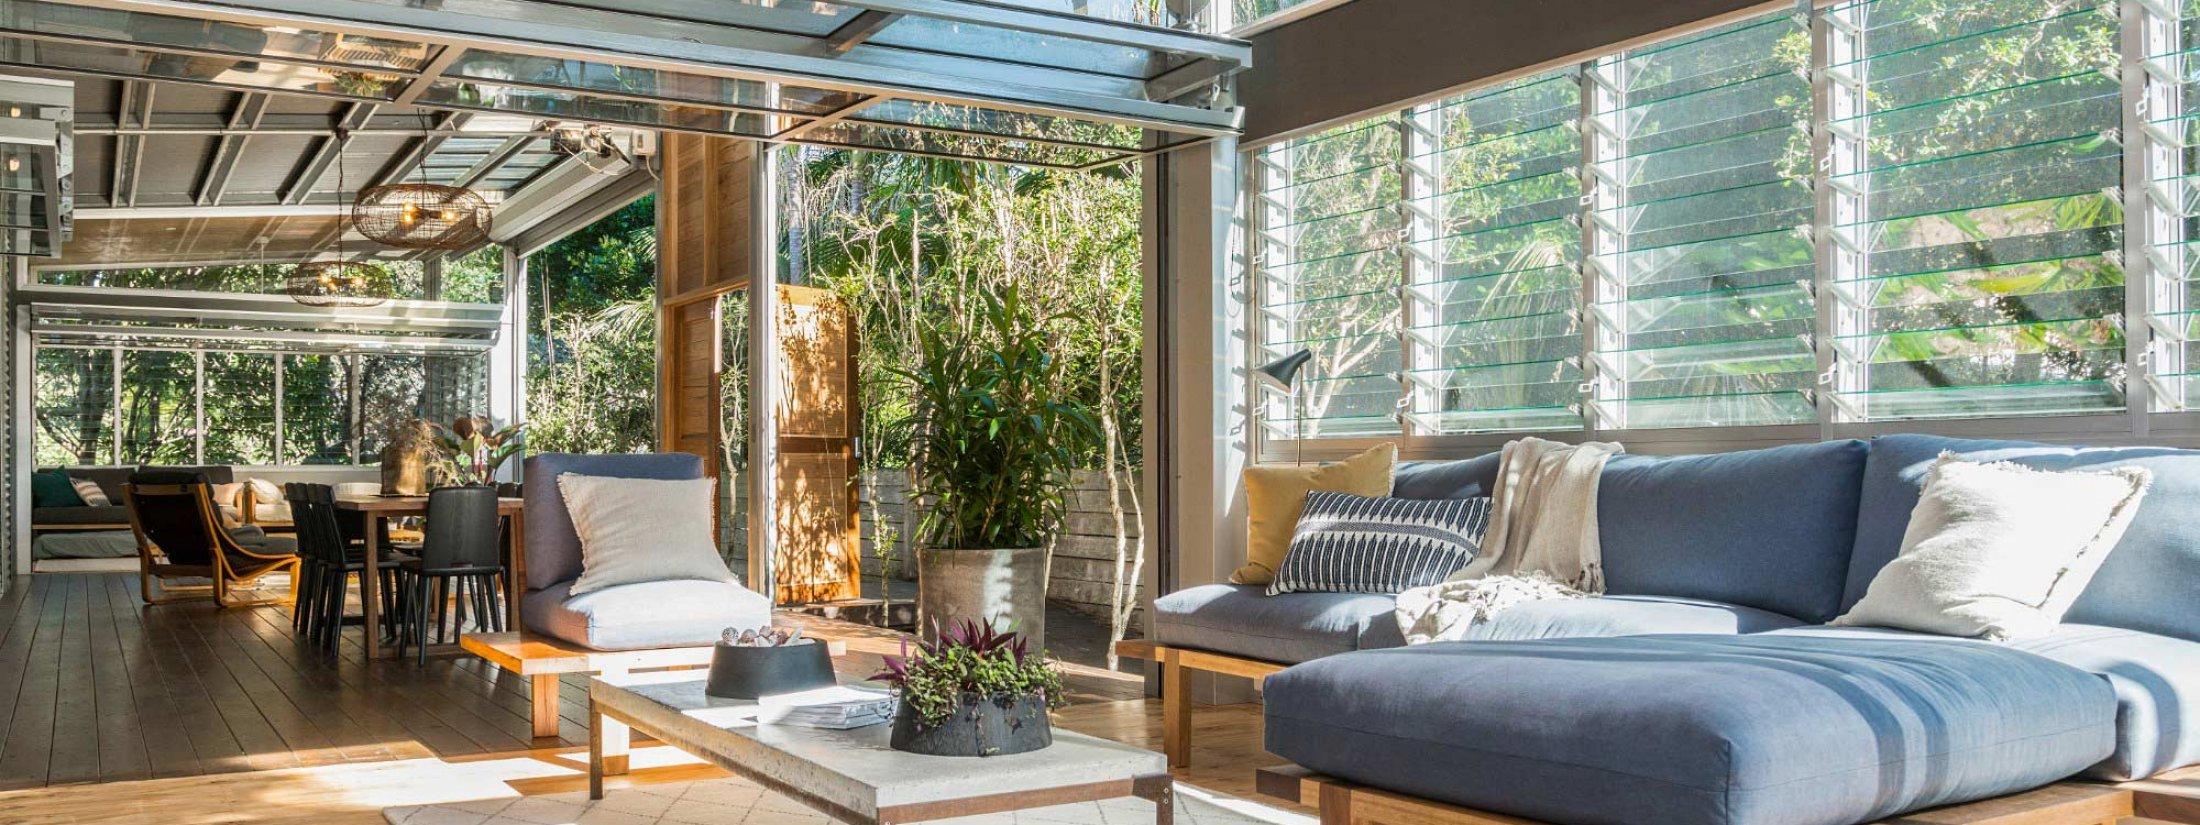 Billabelongil - Byron Bay - Living Room With Dining